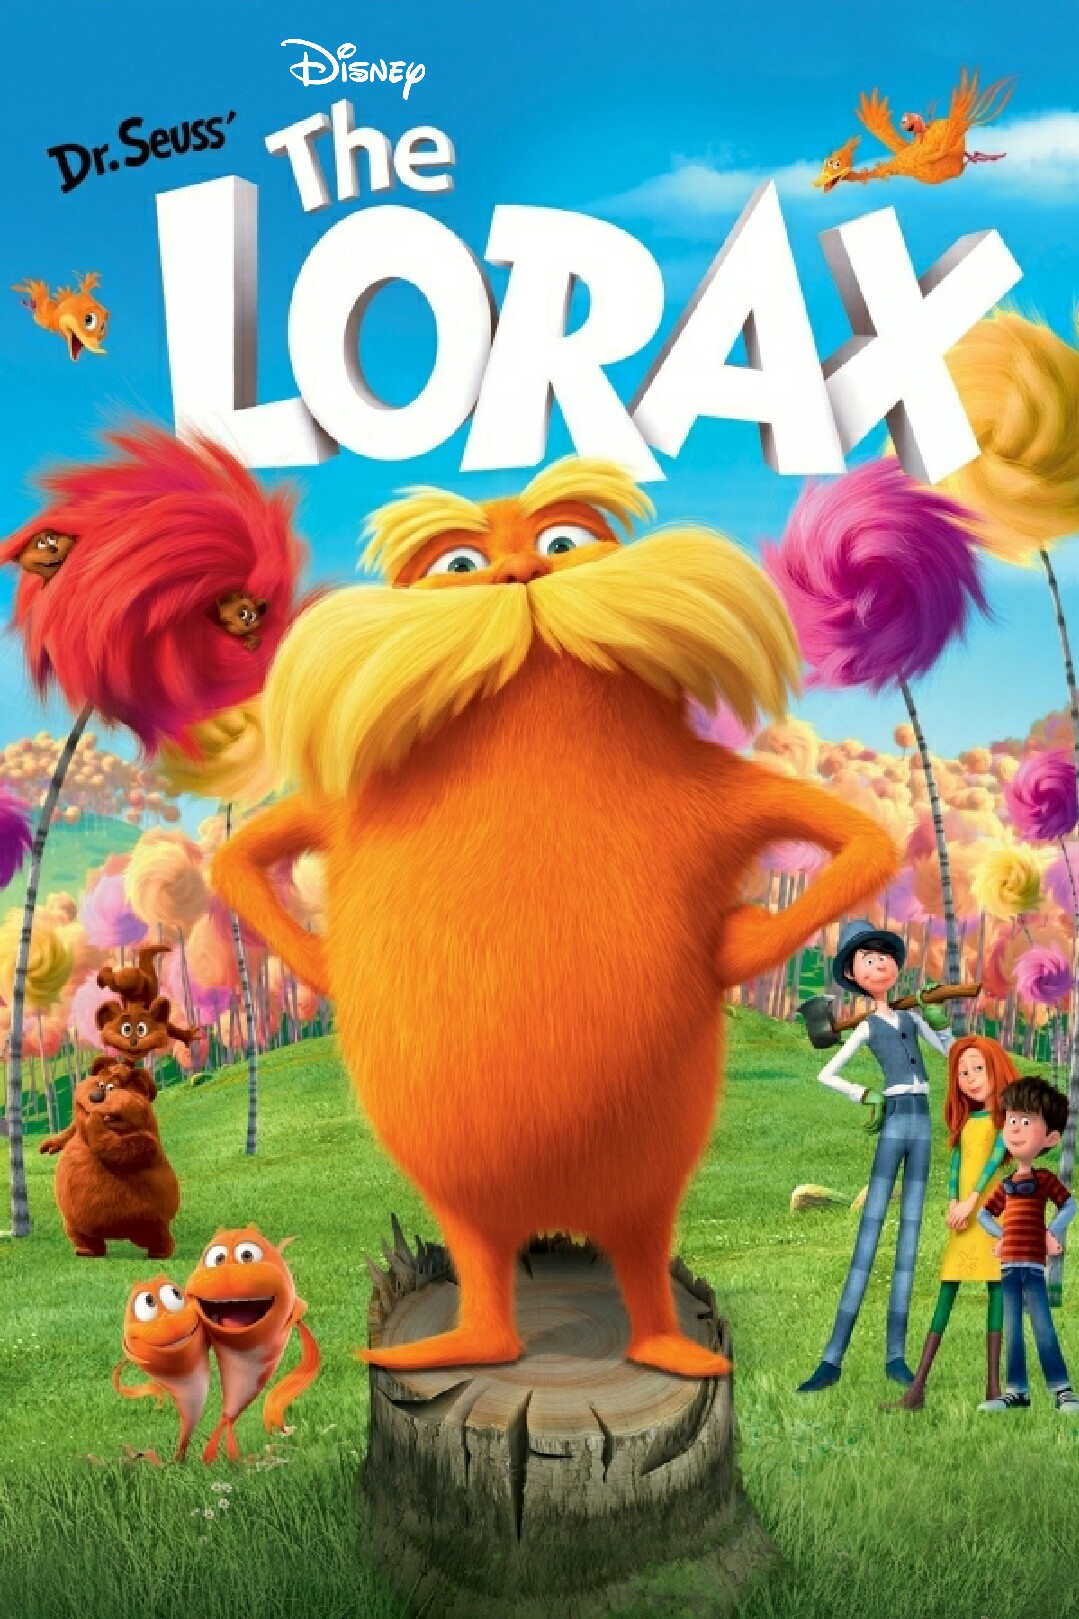 The Lorax | The Disney Fanon Wiki | Fandom